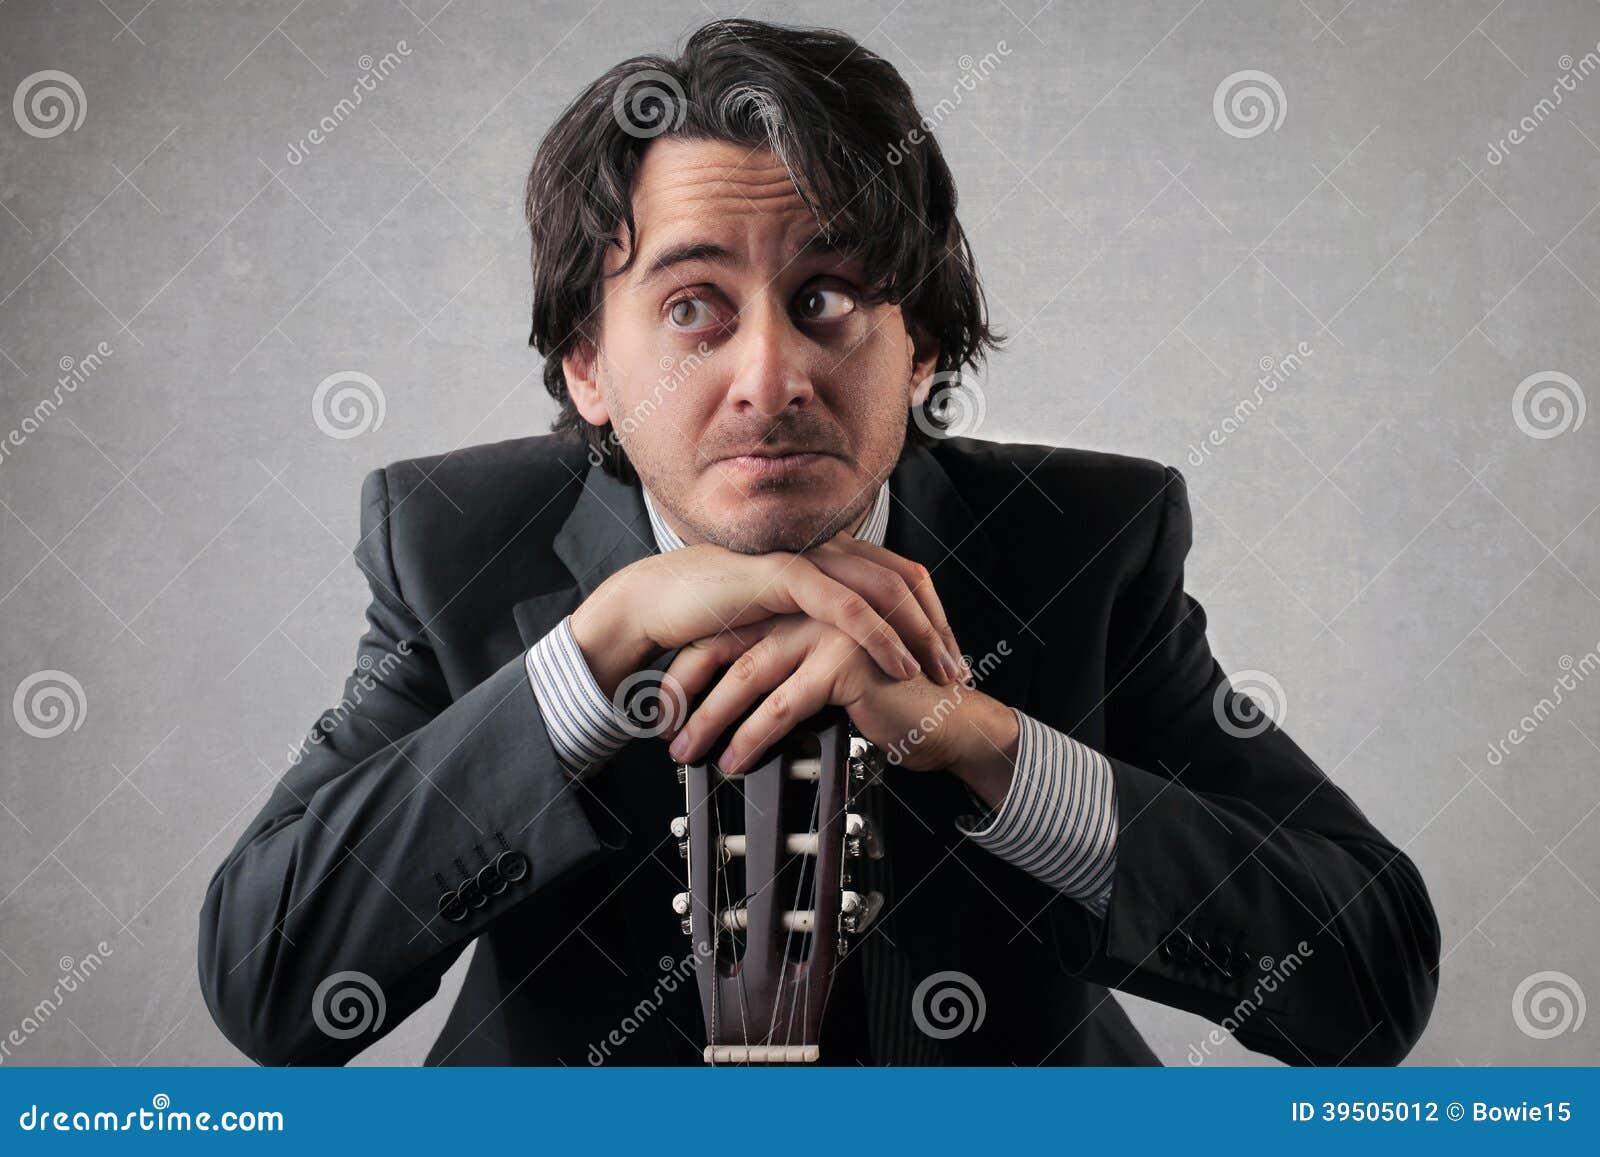 Doubtful businessan with a guitar